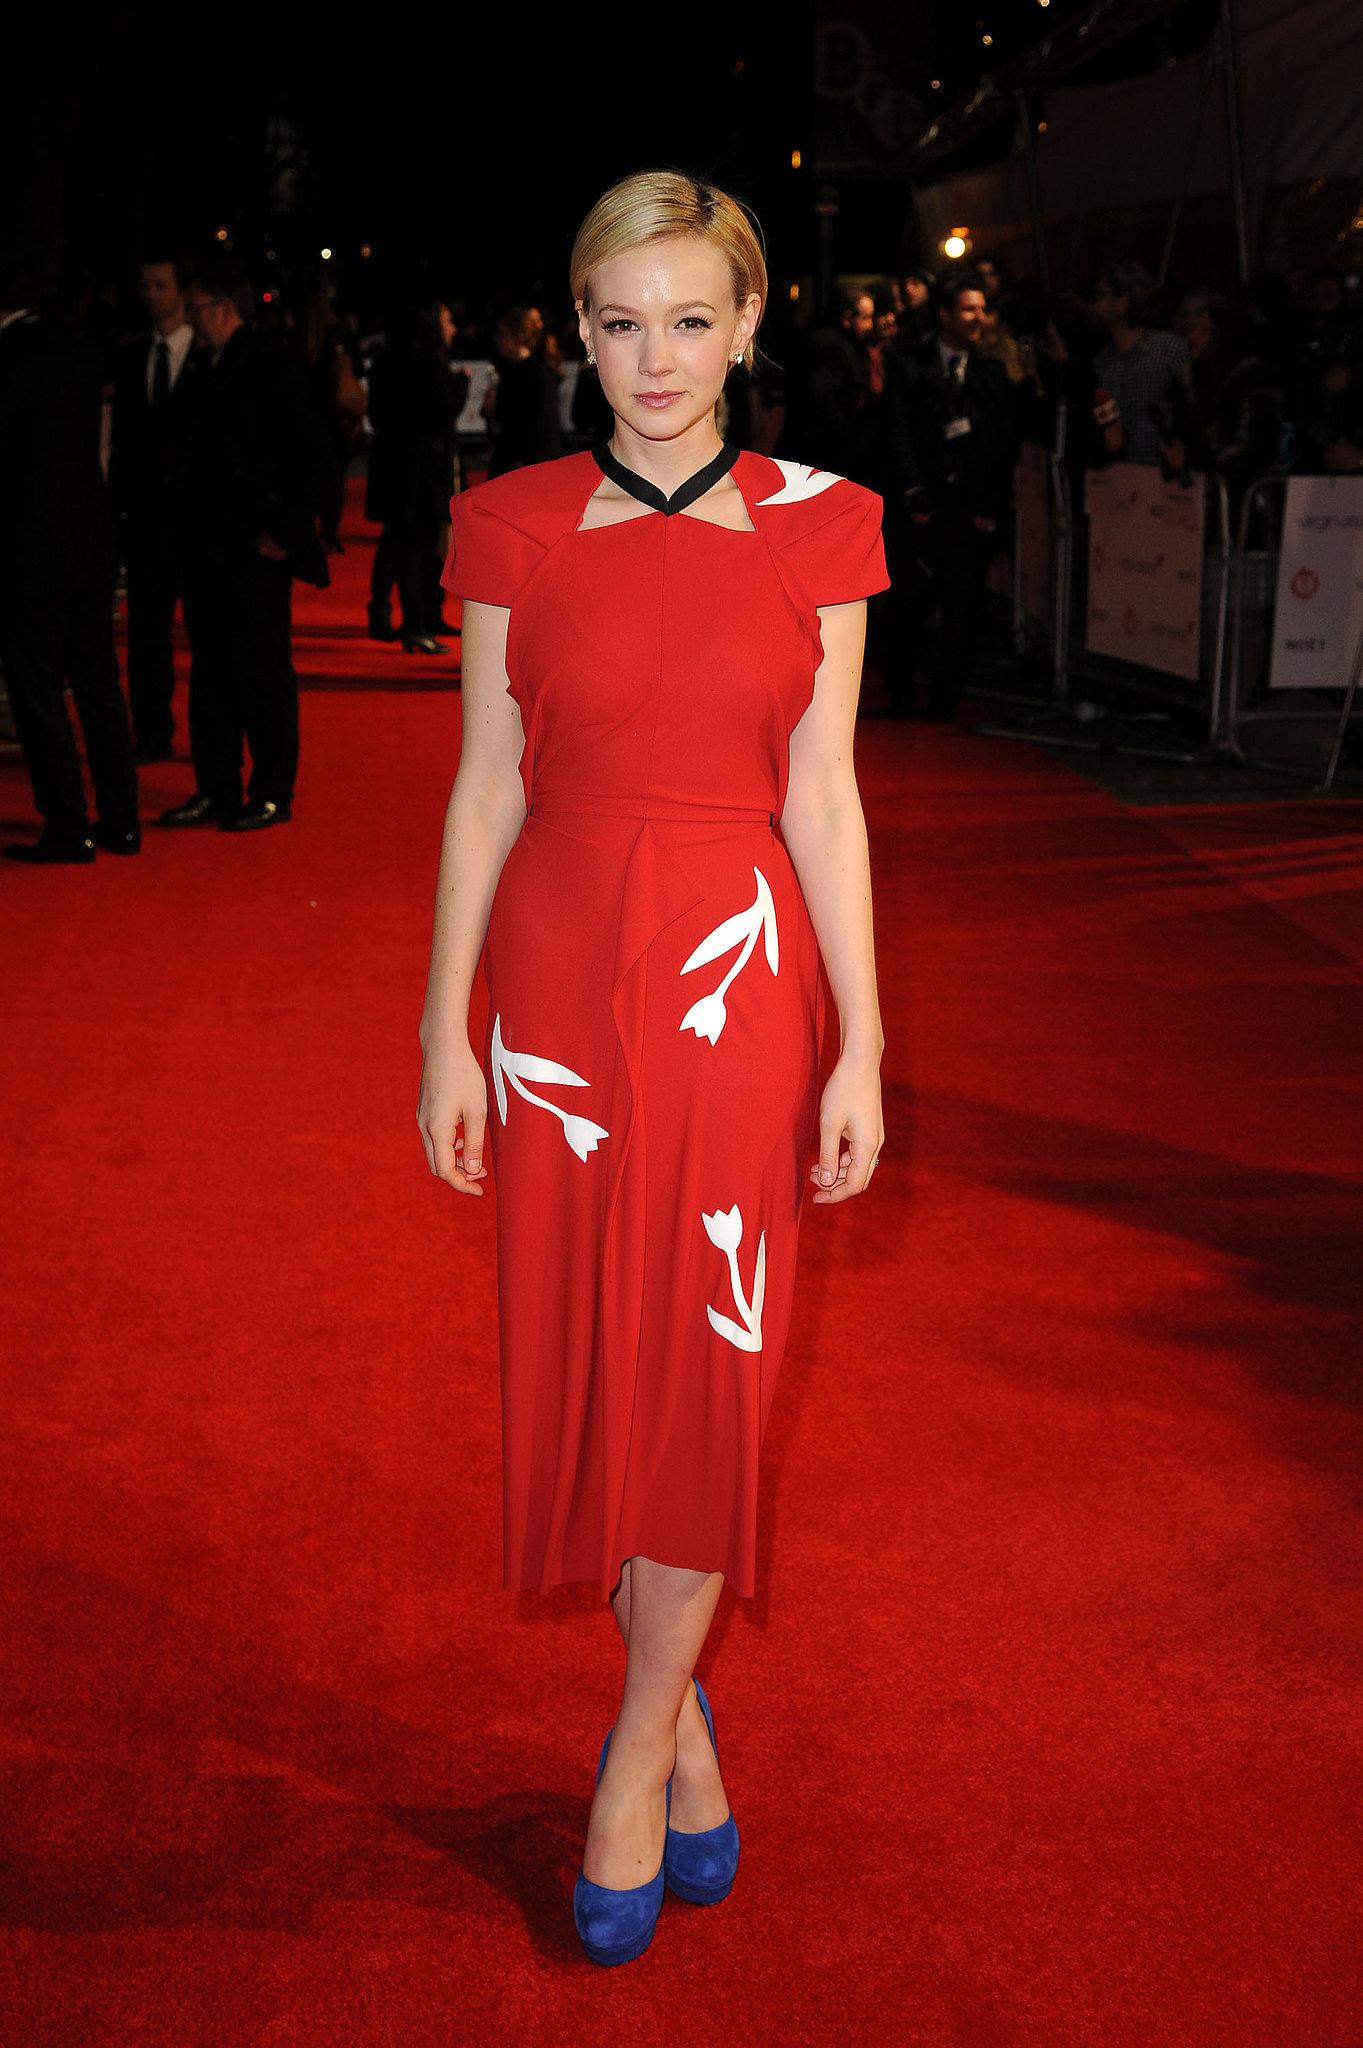 Carey Mulligan in Red Roland Mouret at the 2012 London Film Critics' Circle Awards